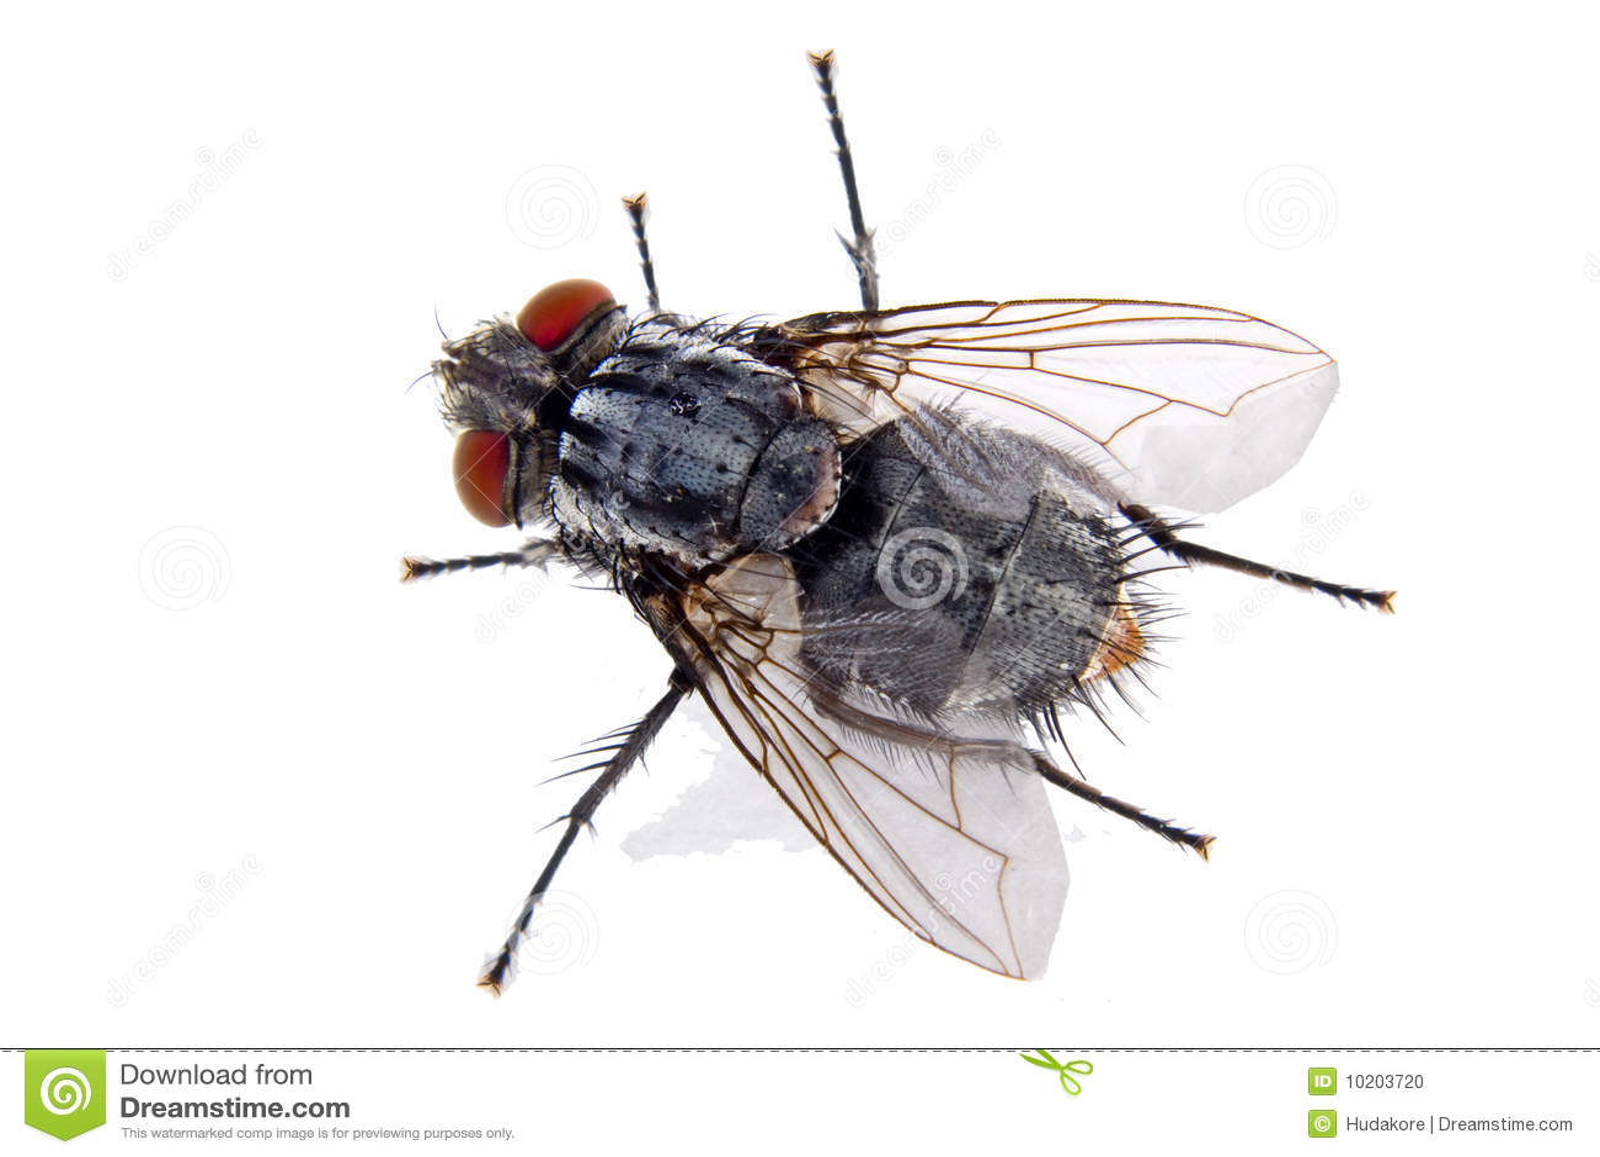 House Fly Stock Photo - Image: 10203720